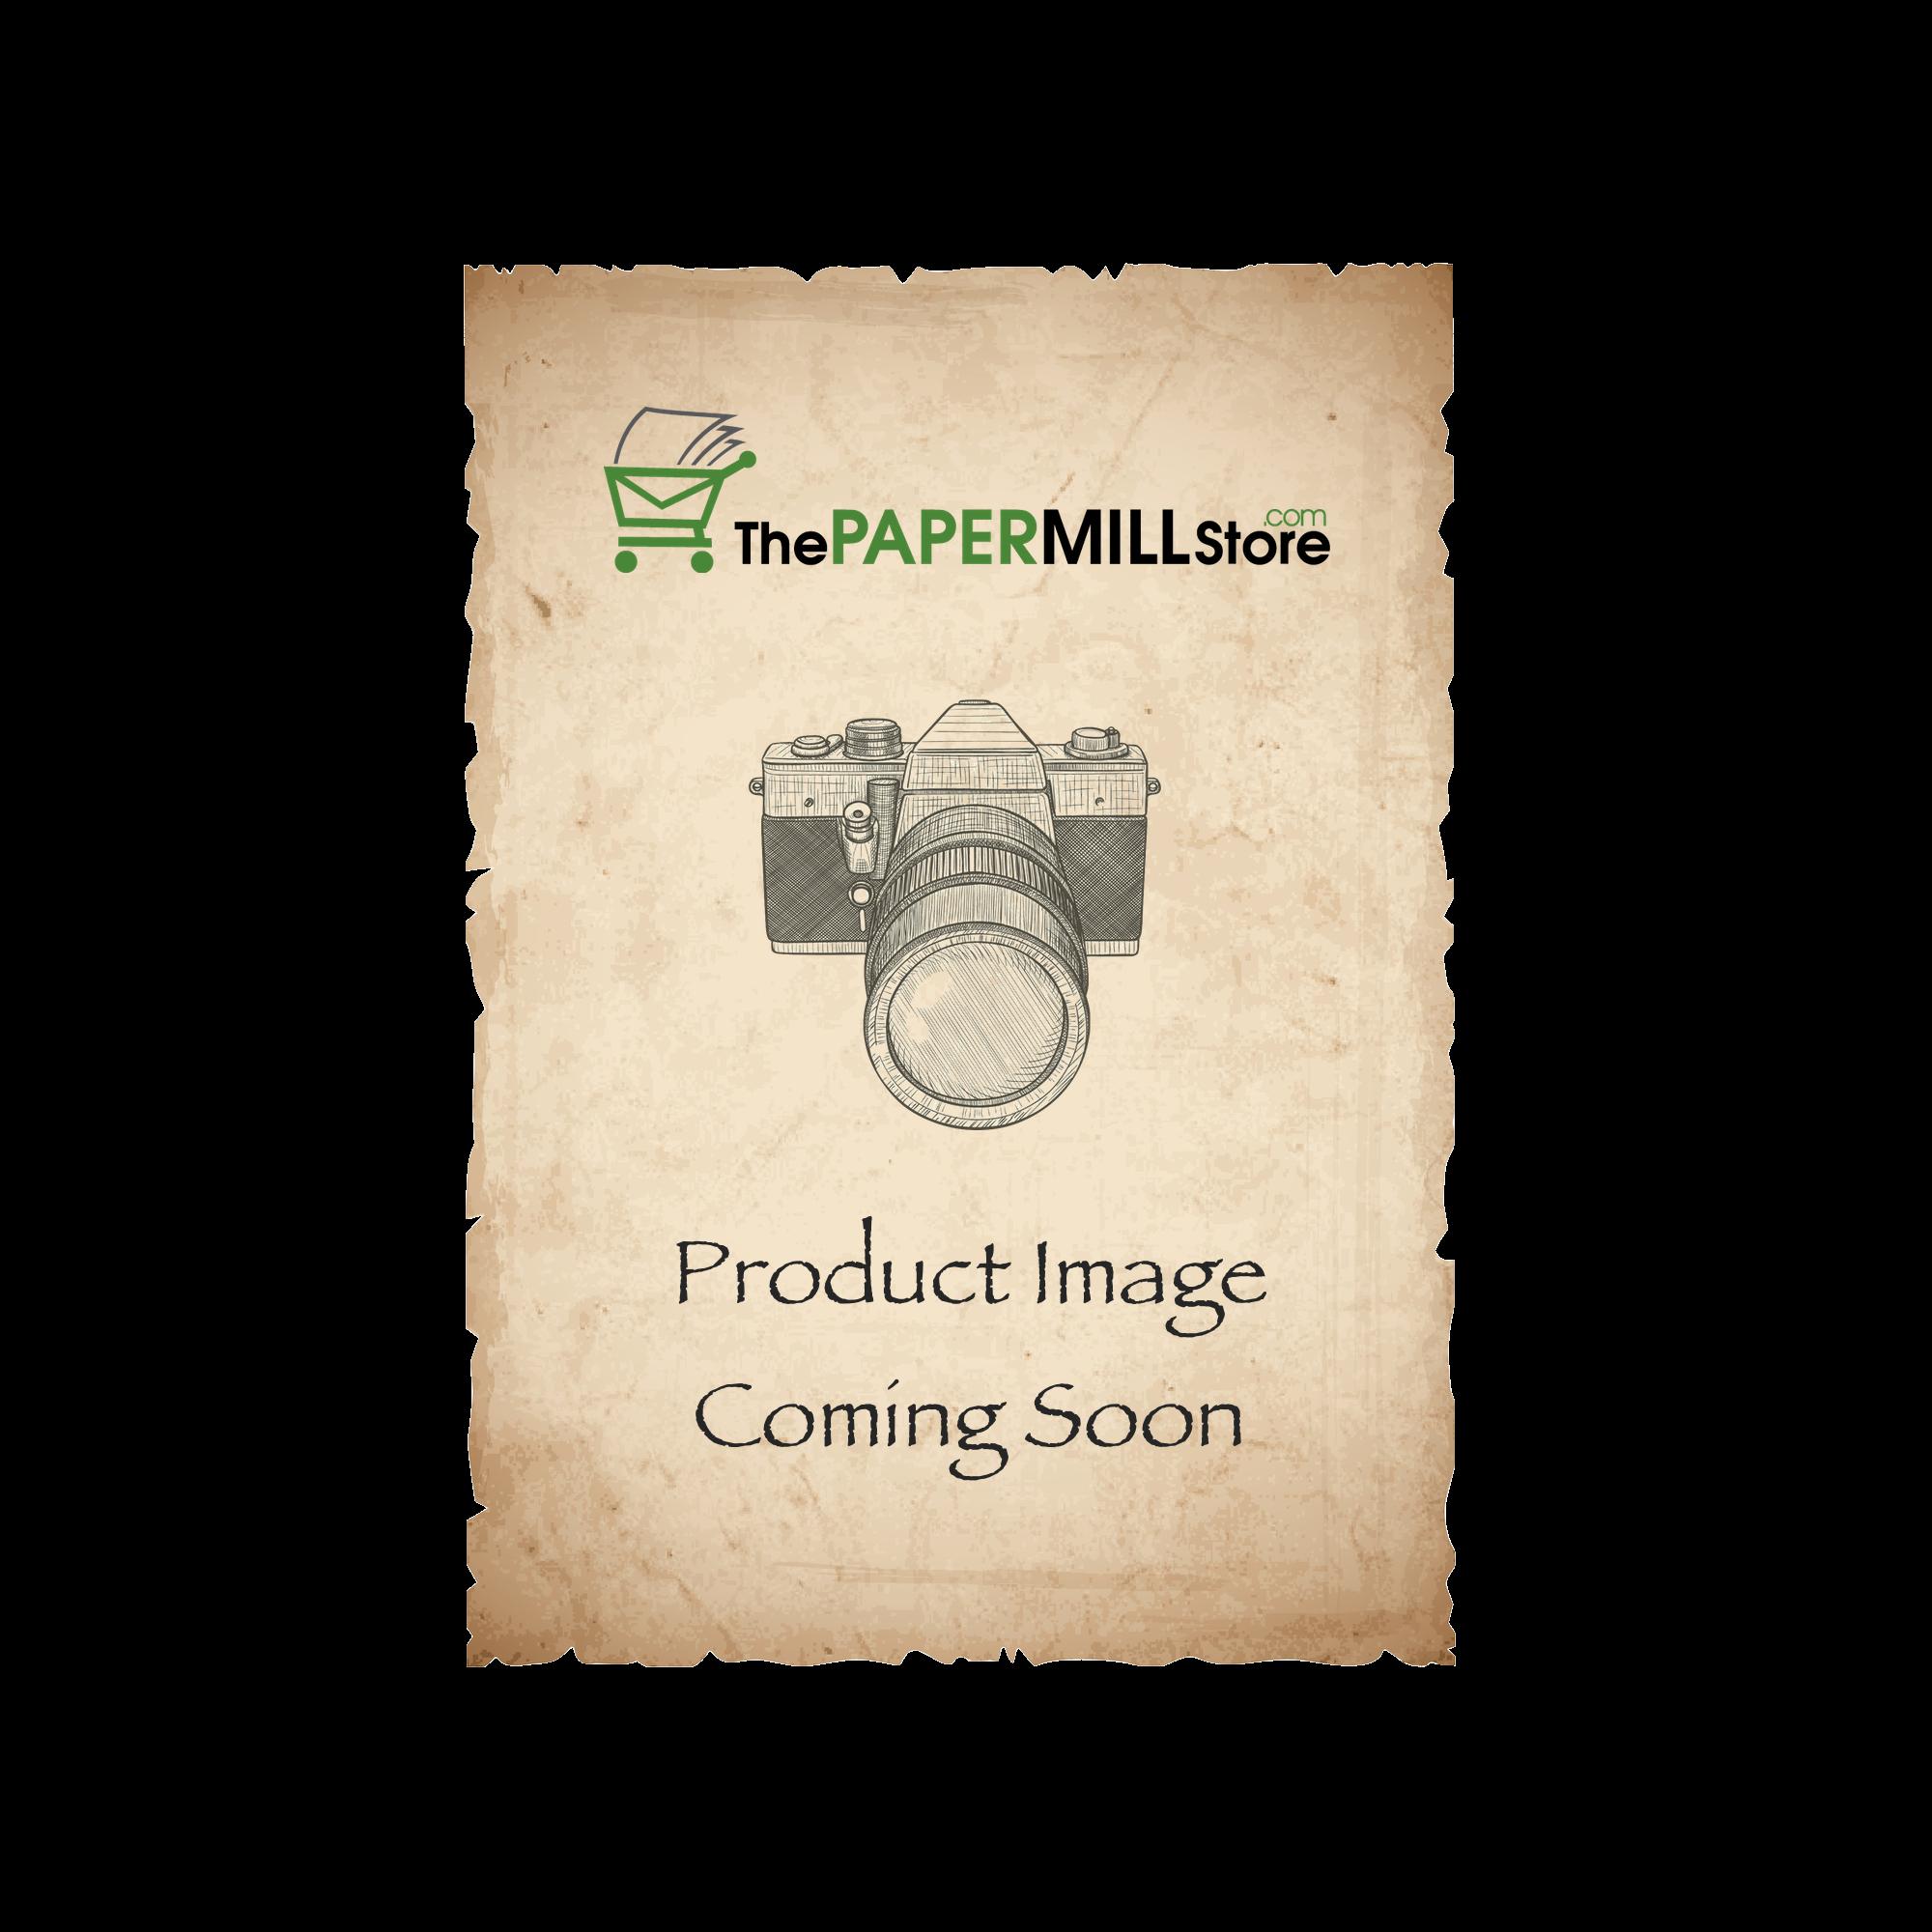 Exact Vellum Bristol Green Paper - 8 1/2 x 11 in 67 lb Bristol Vellum 250 per Package